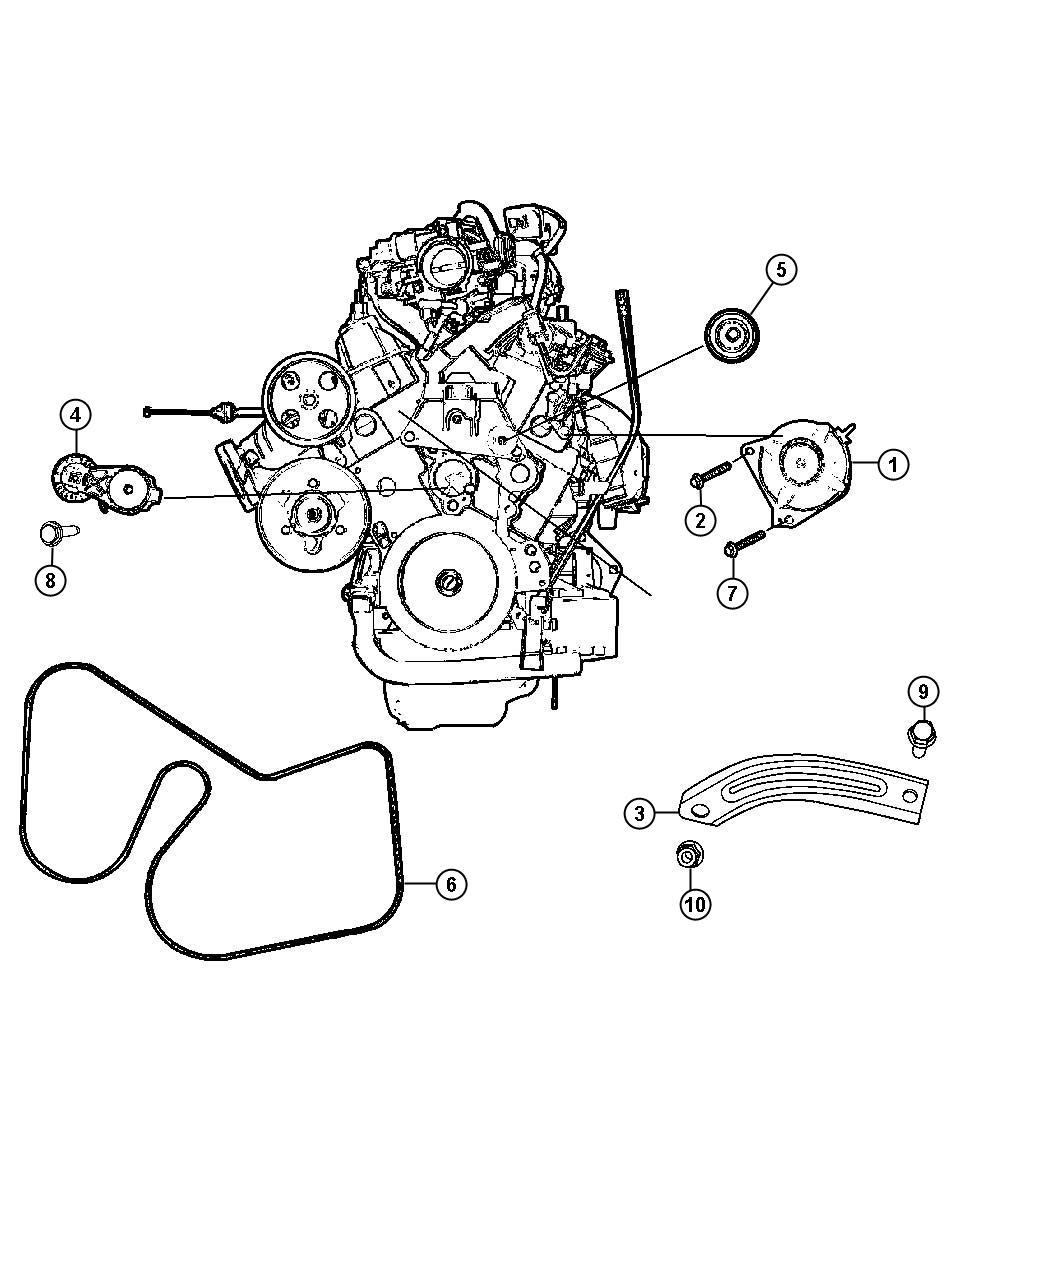 2010 dodge generator  engine  alternatorcomplete